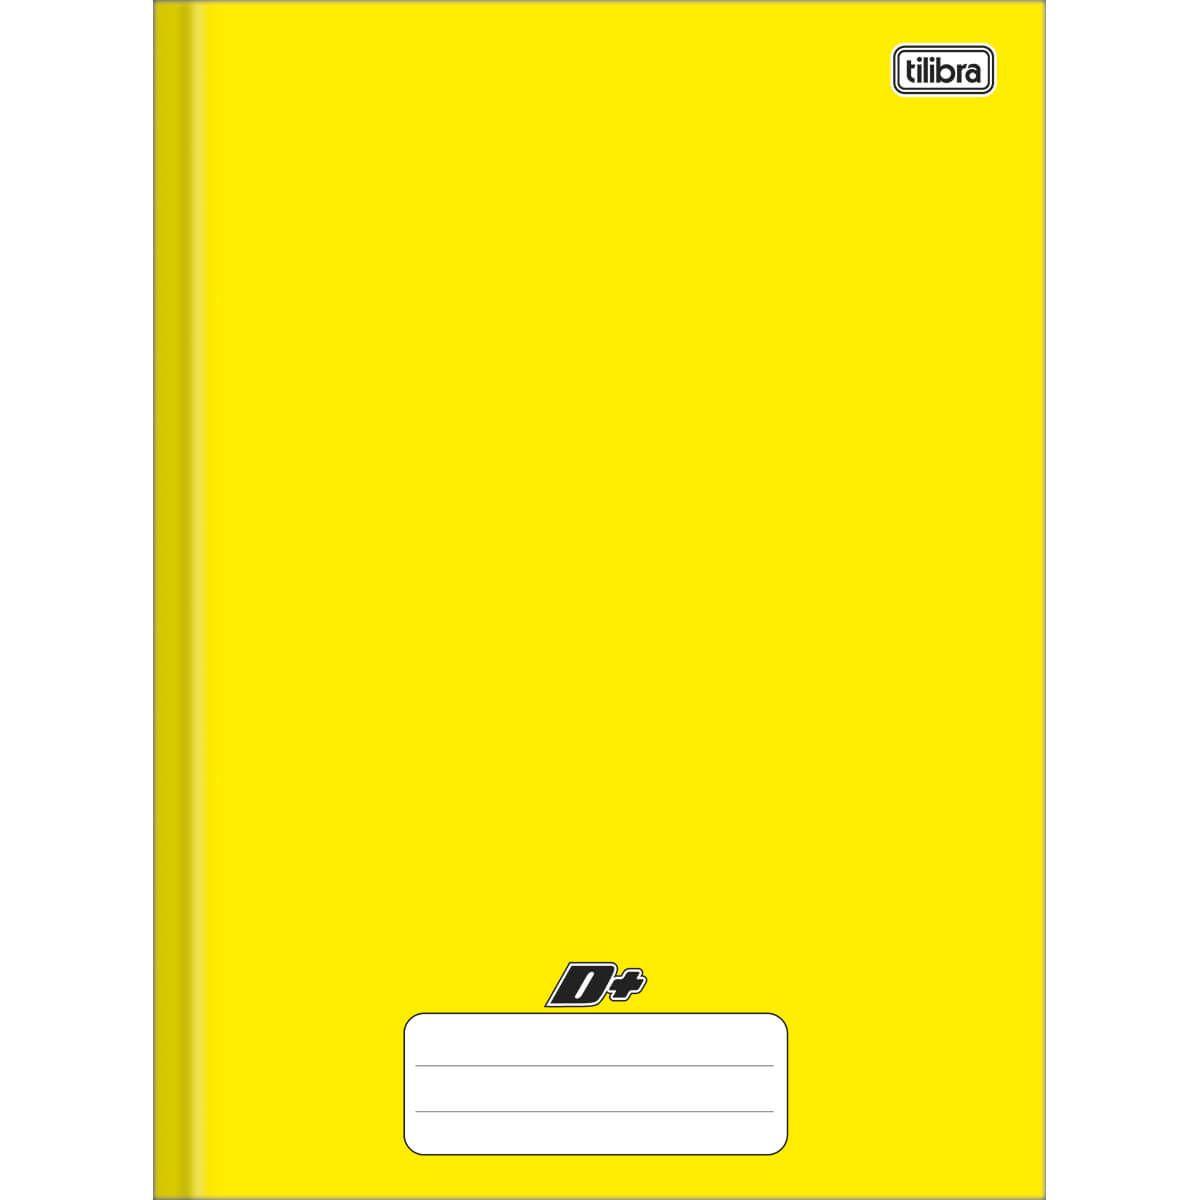 Caderno brochura 1/4 96 fls amarelo D+ Tilibra